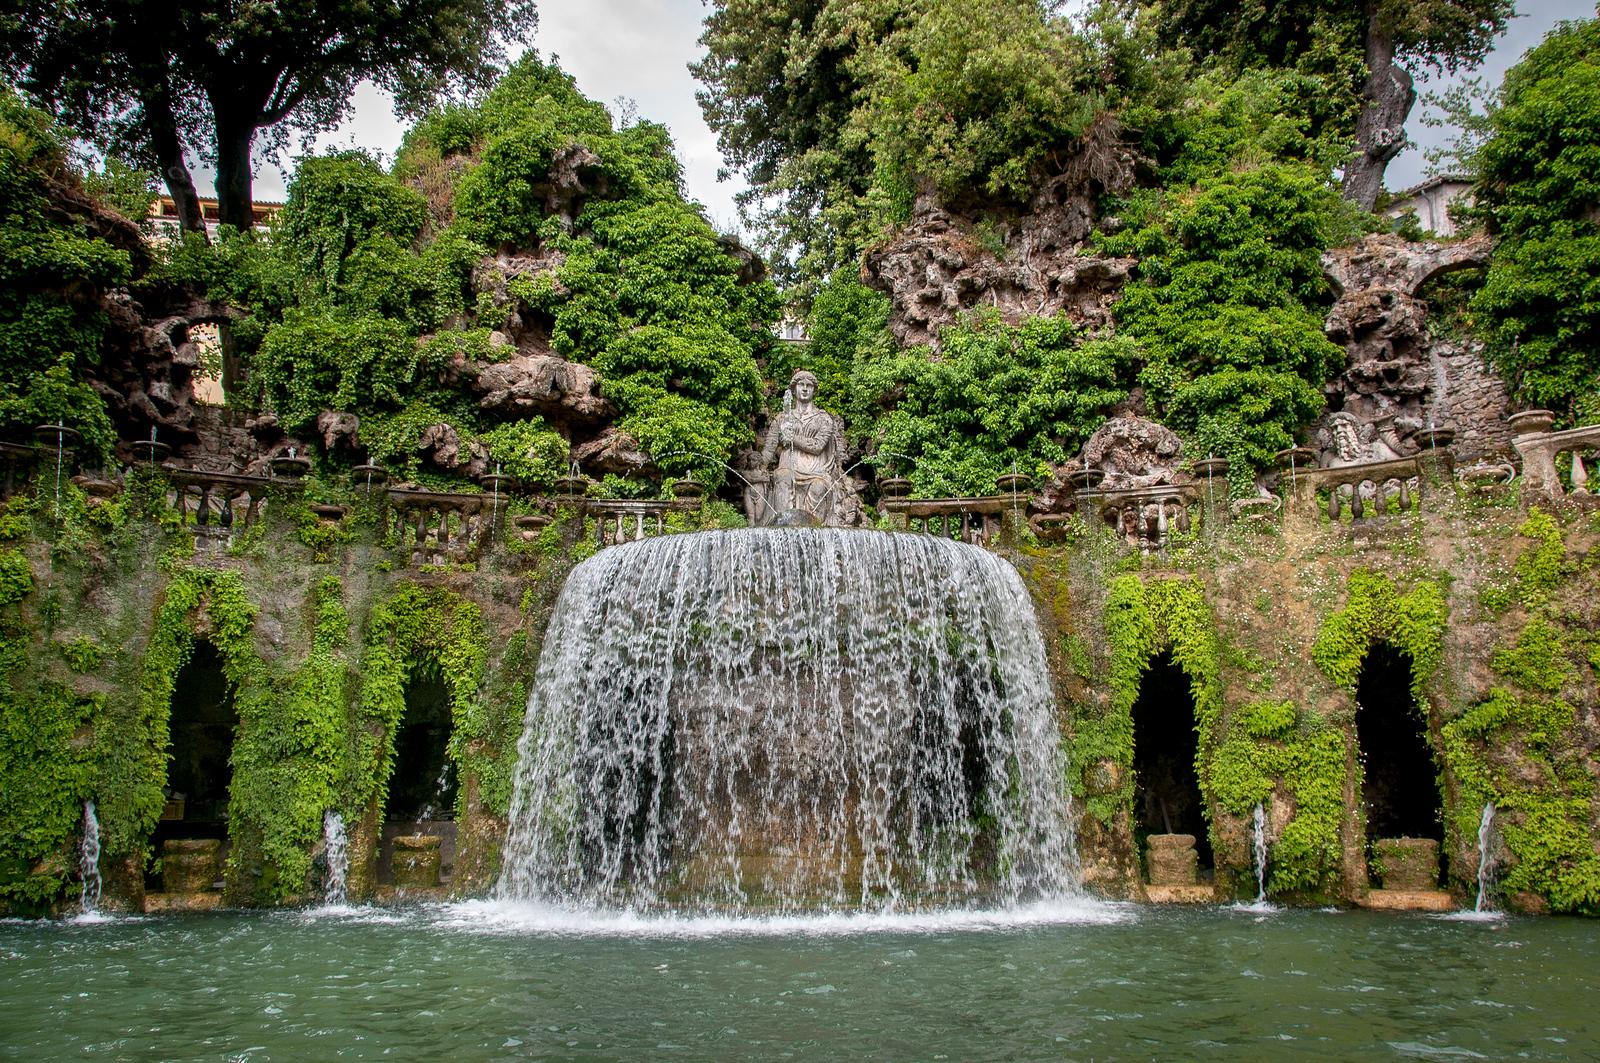 Villa d'Este, Tivoli UNESCO World Heritage Site, Italy